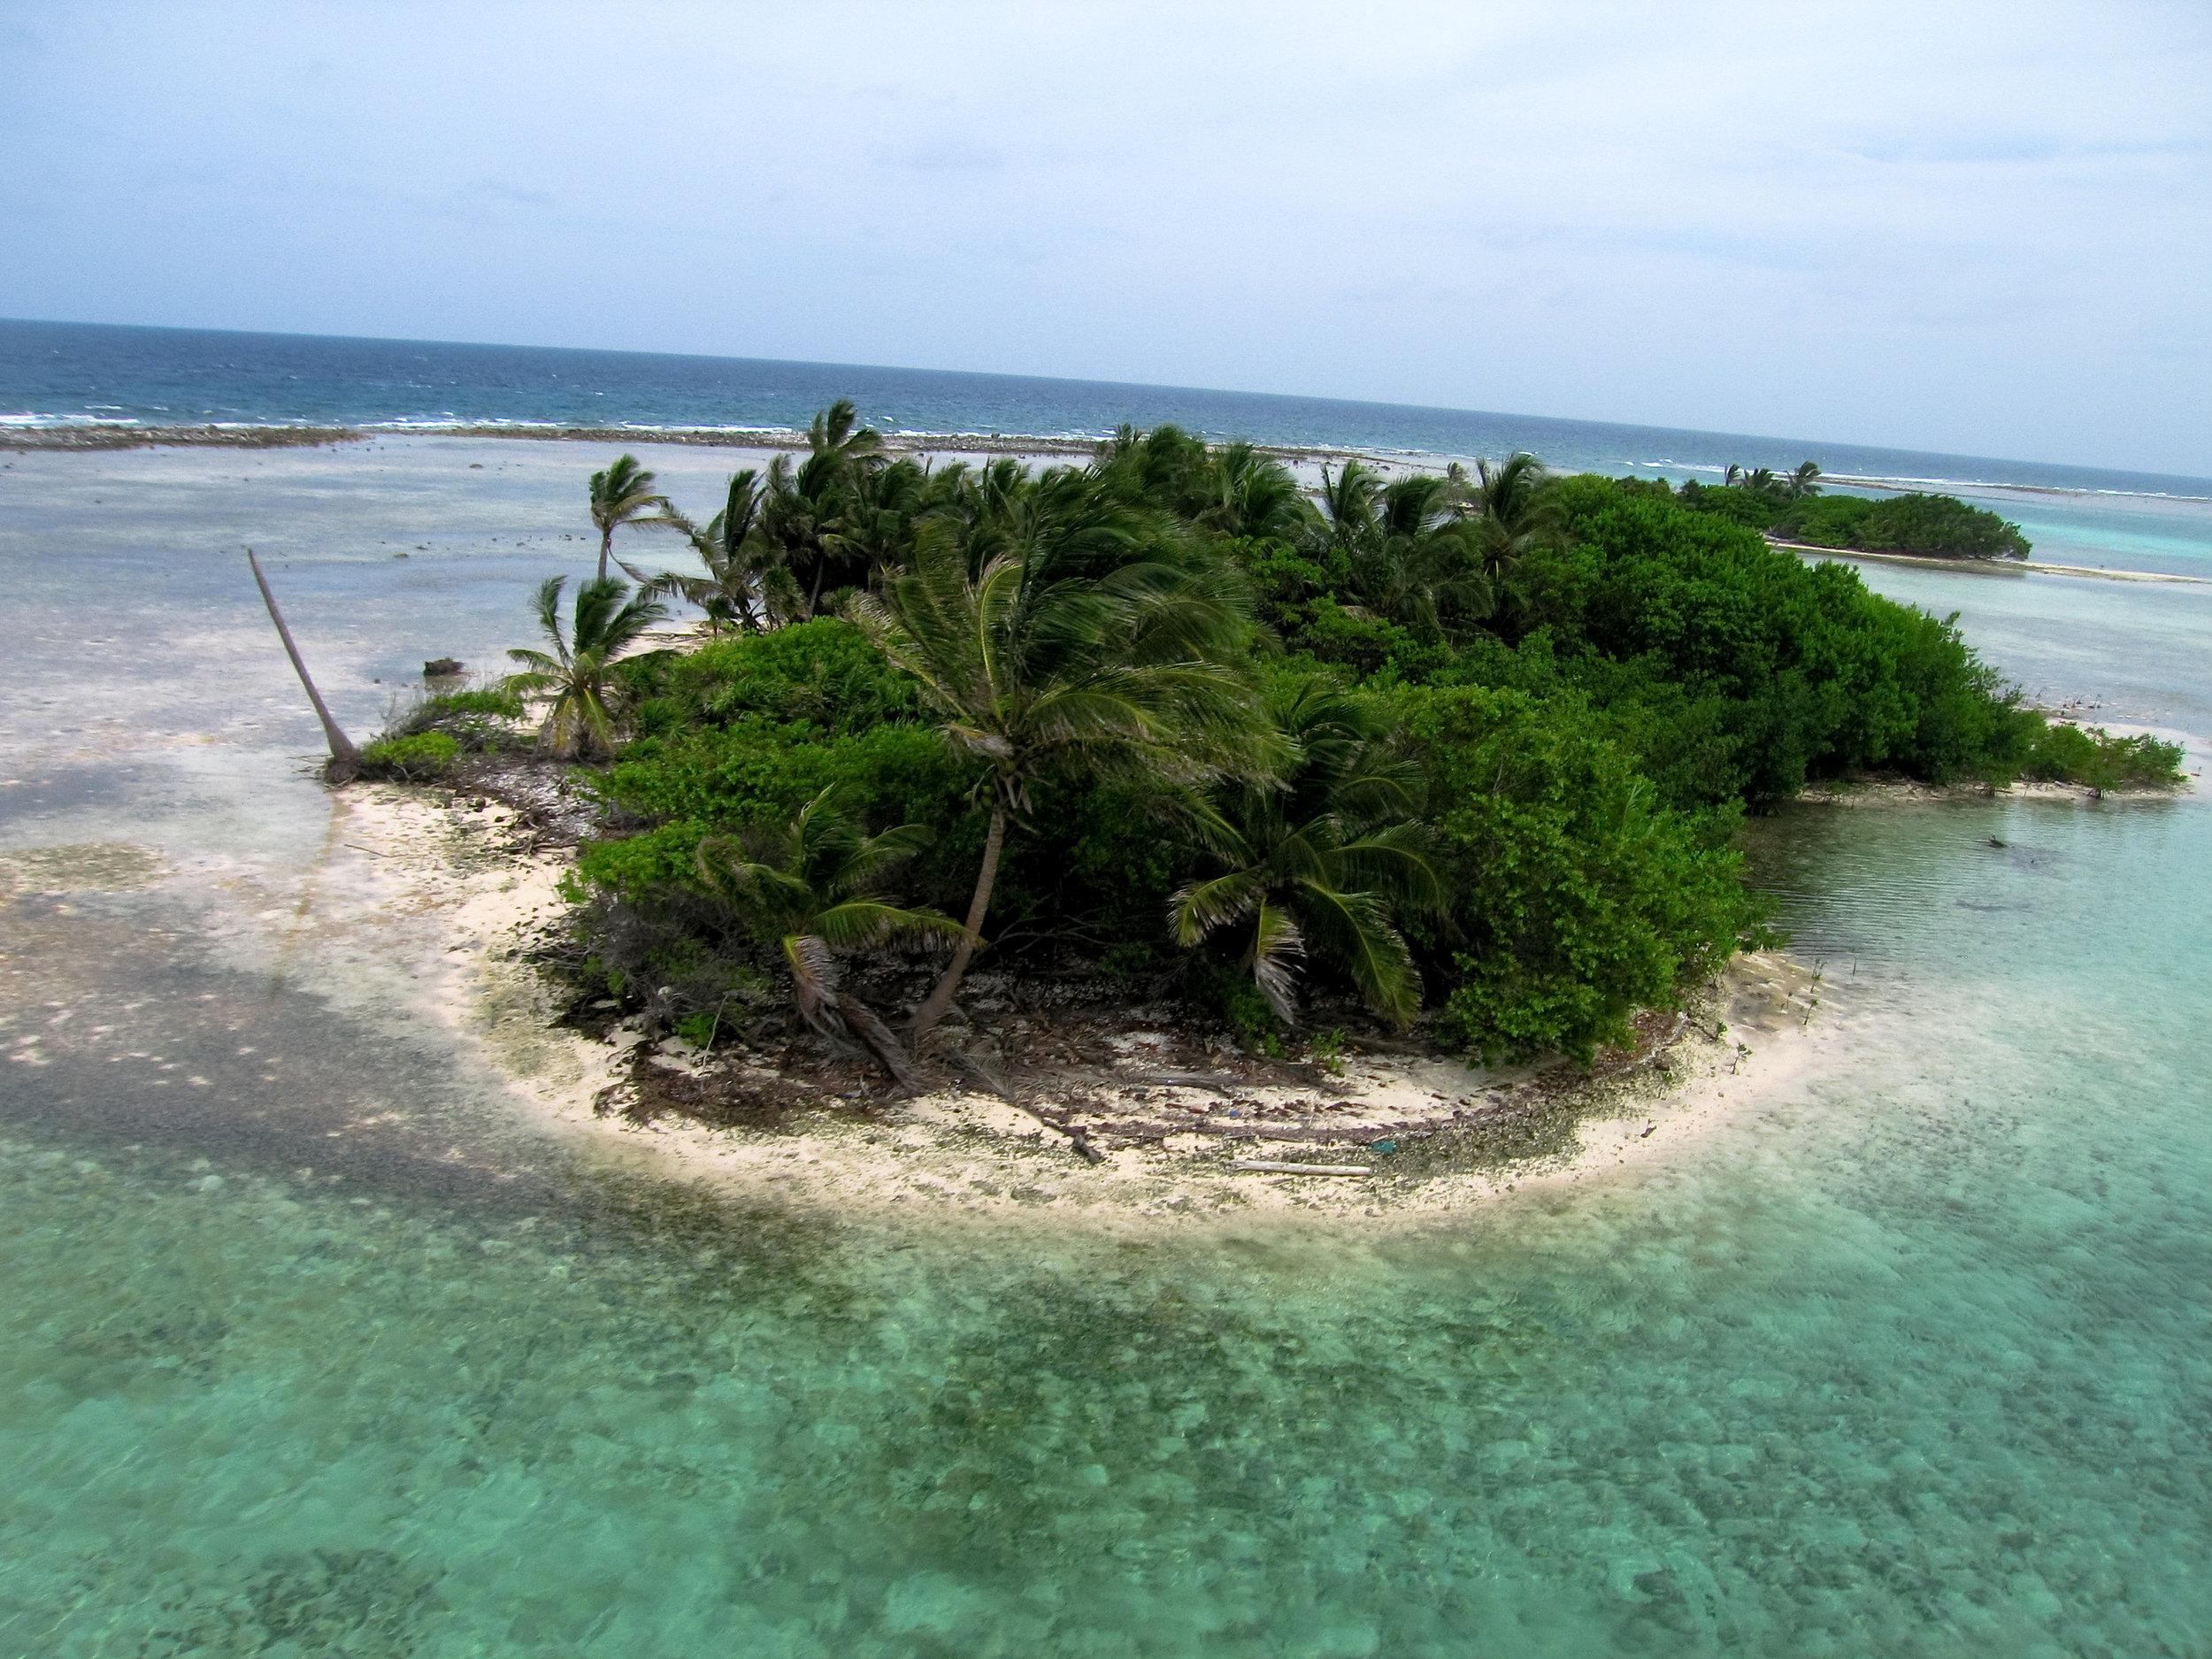 Astrum_Turneffe Islands_212.jpg